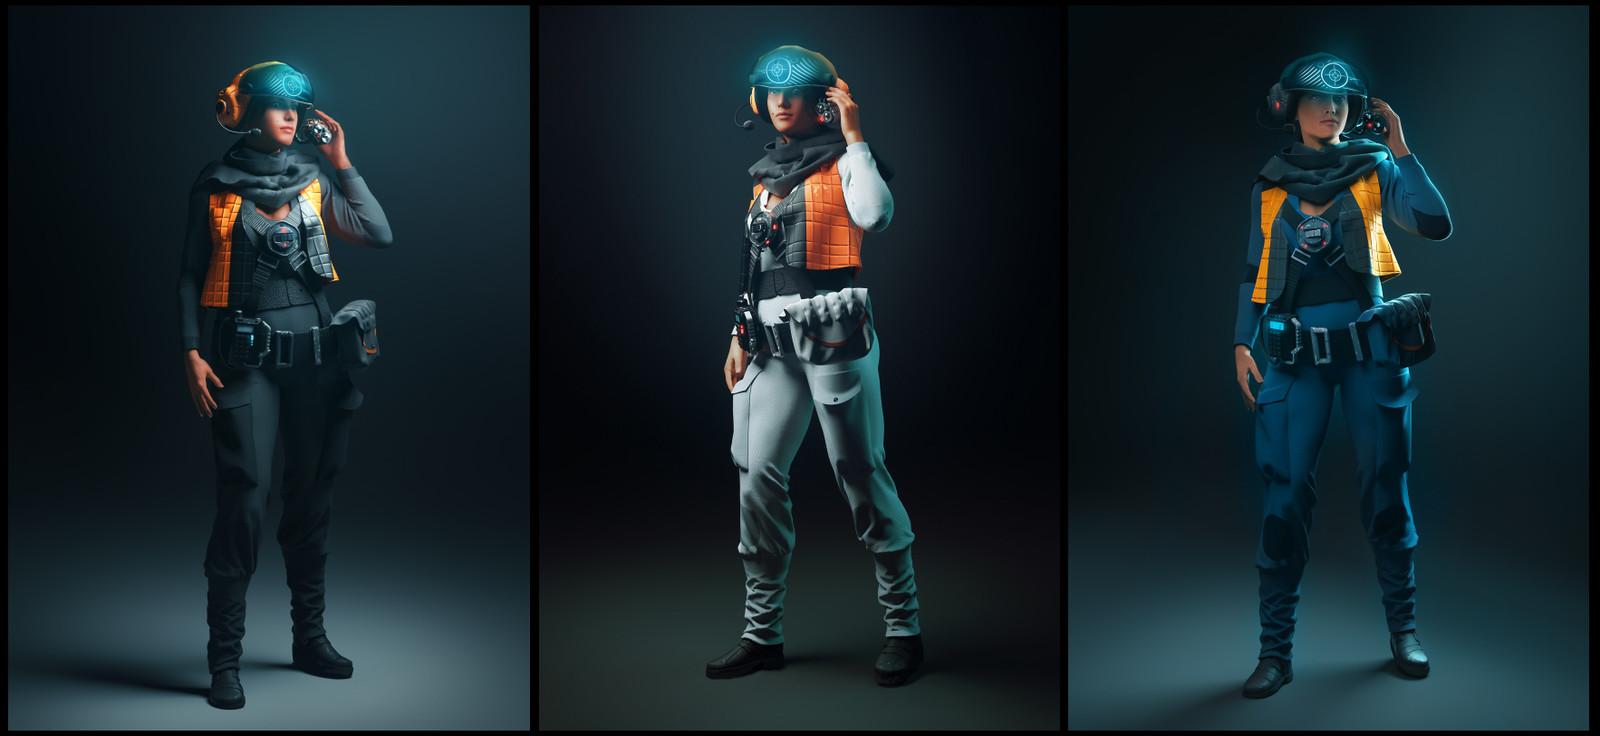 Pilot variations